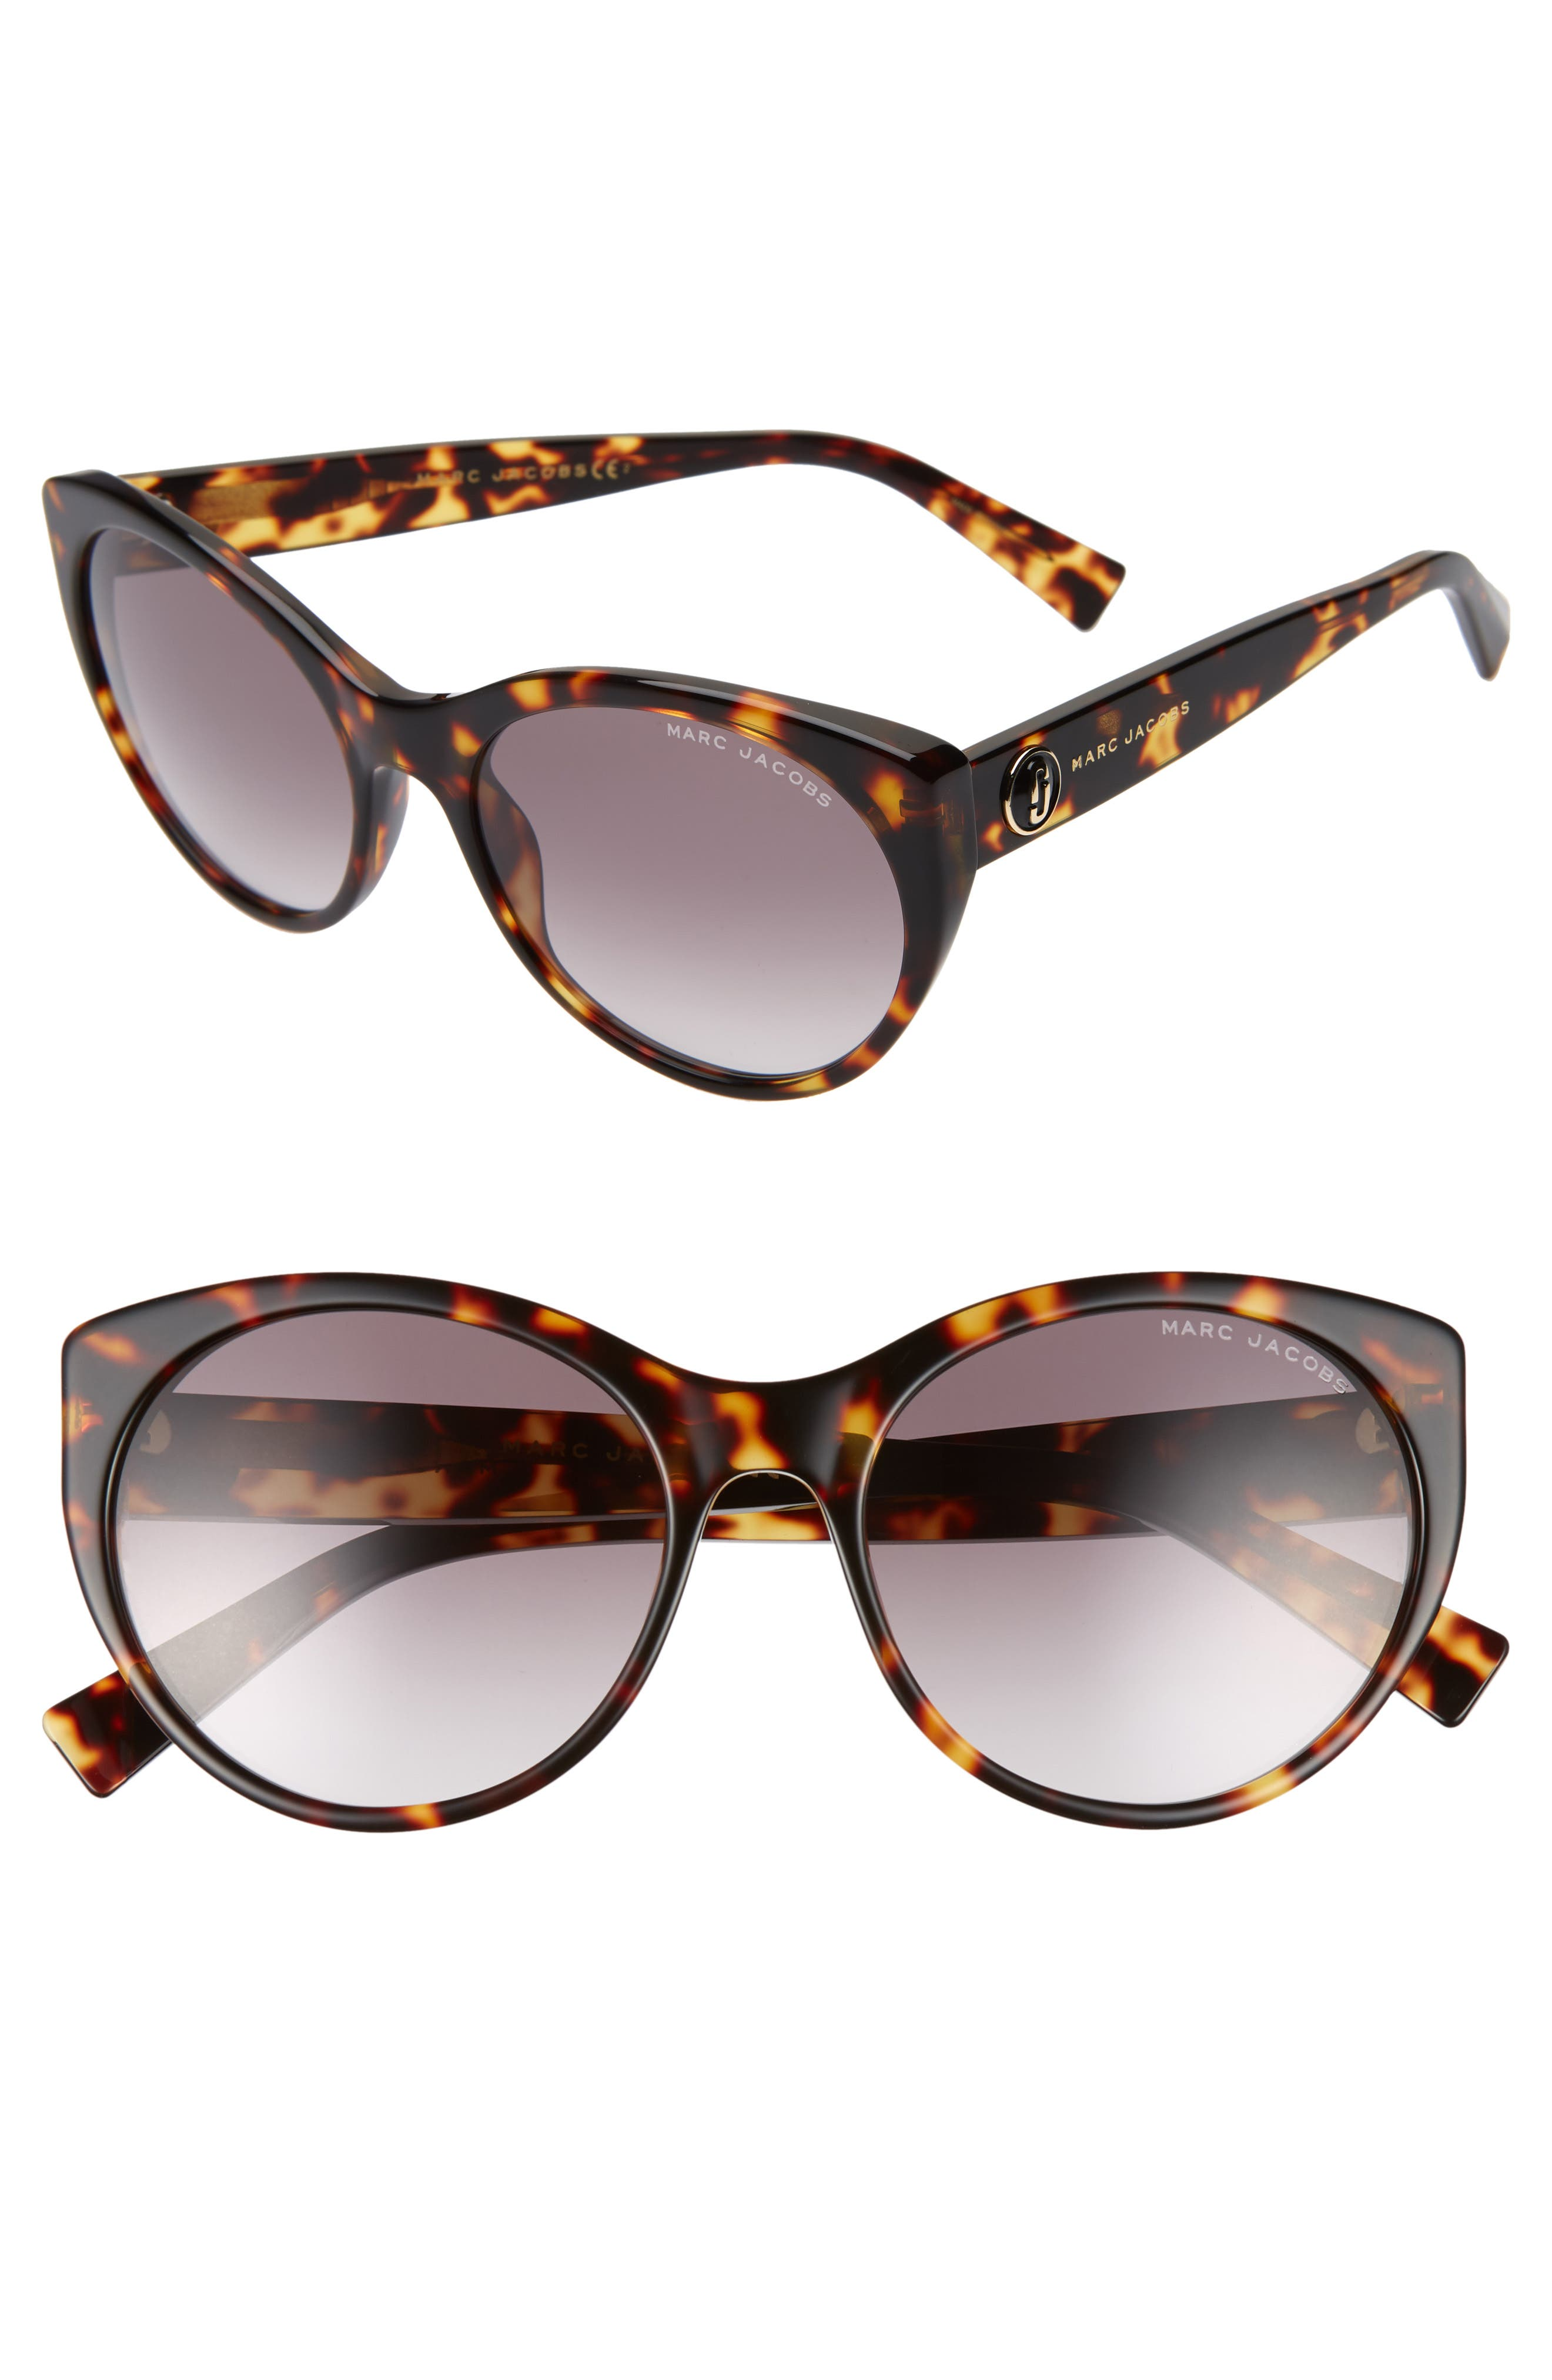 MARC JACOBS 57mm Round Sunglasses, Main, color, BLACK DARK HAVANA